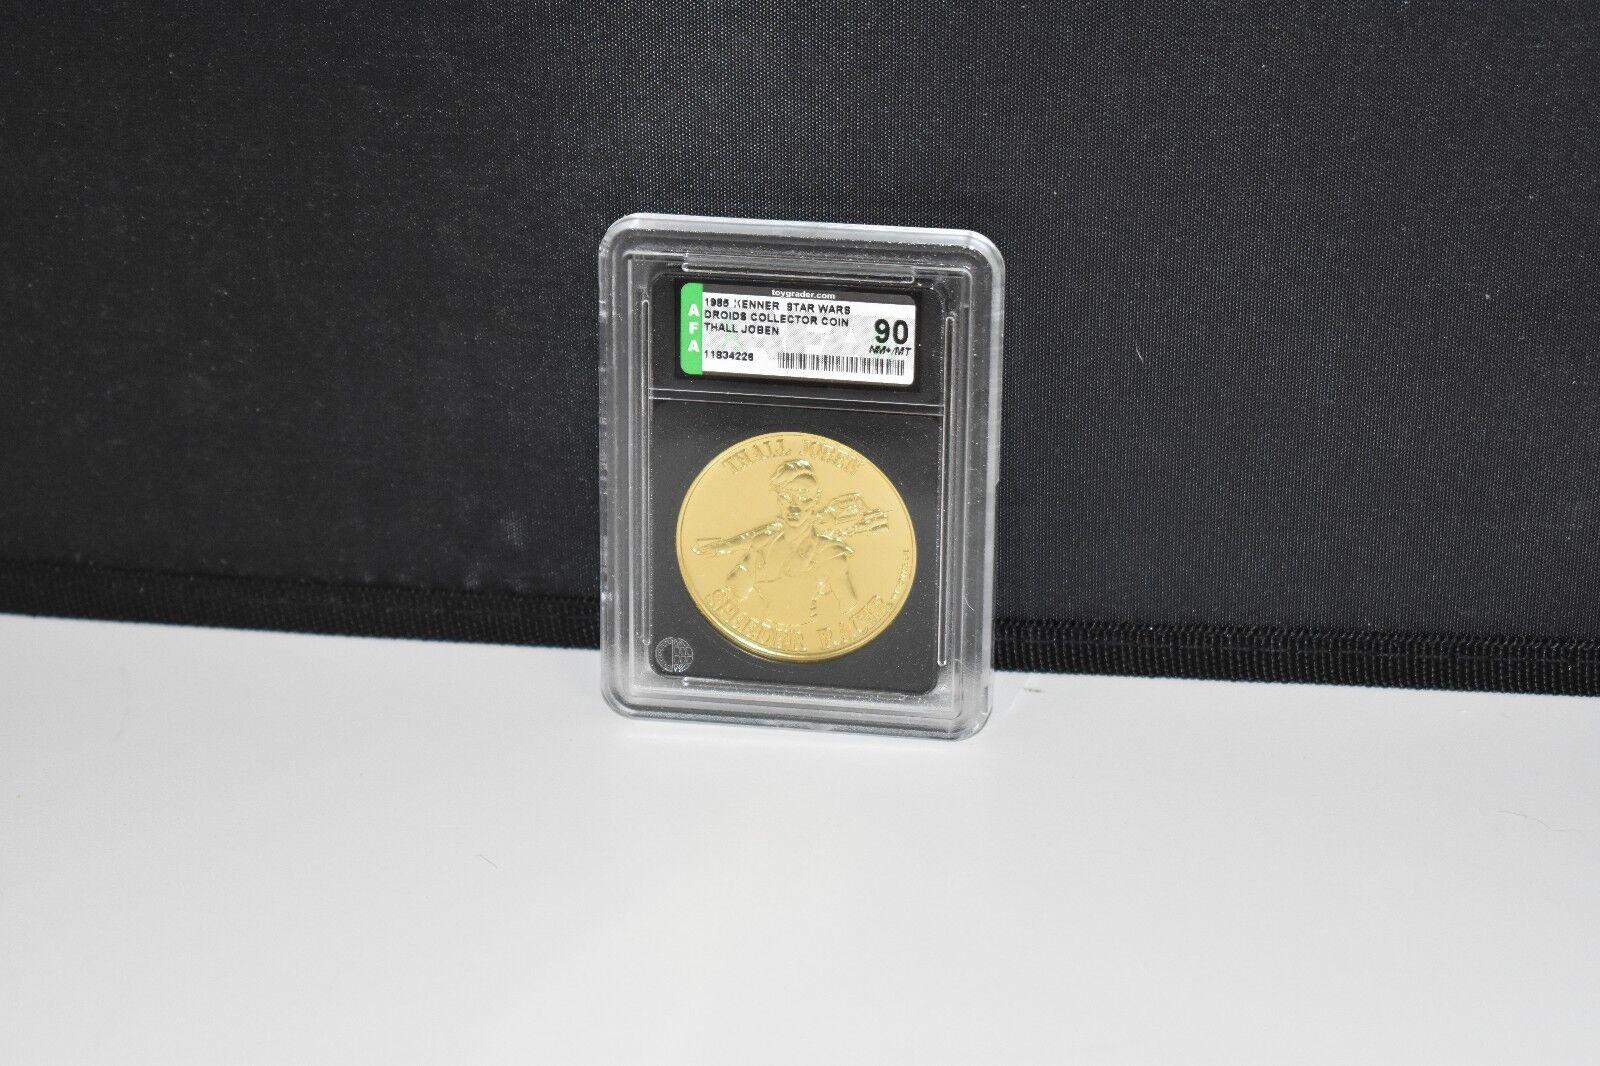 Vintage 1985 Kenner Star Wars POTF DROIDS THALL JOBEN Coin - AFA 90 NM+